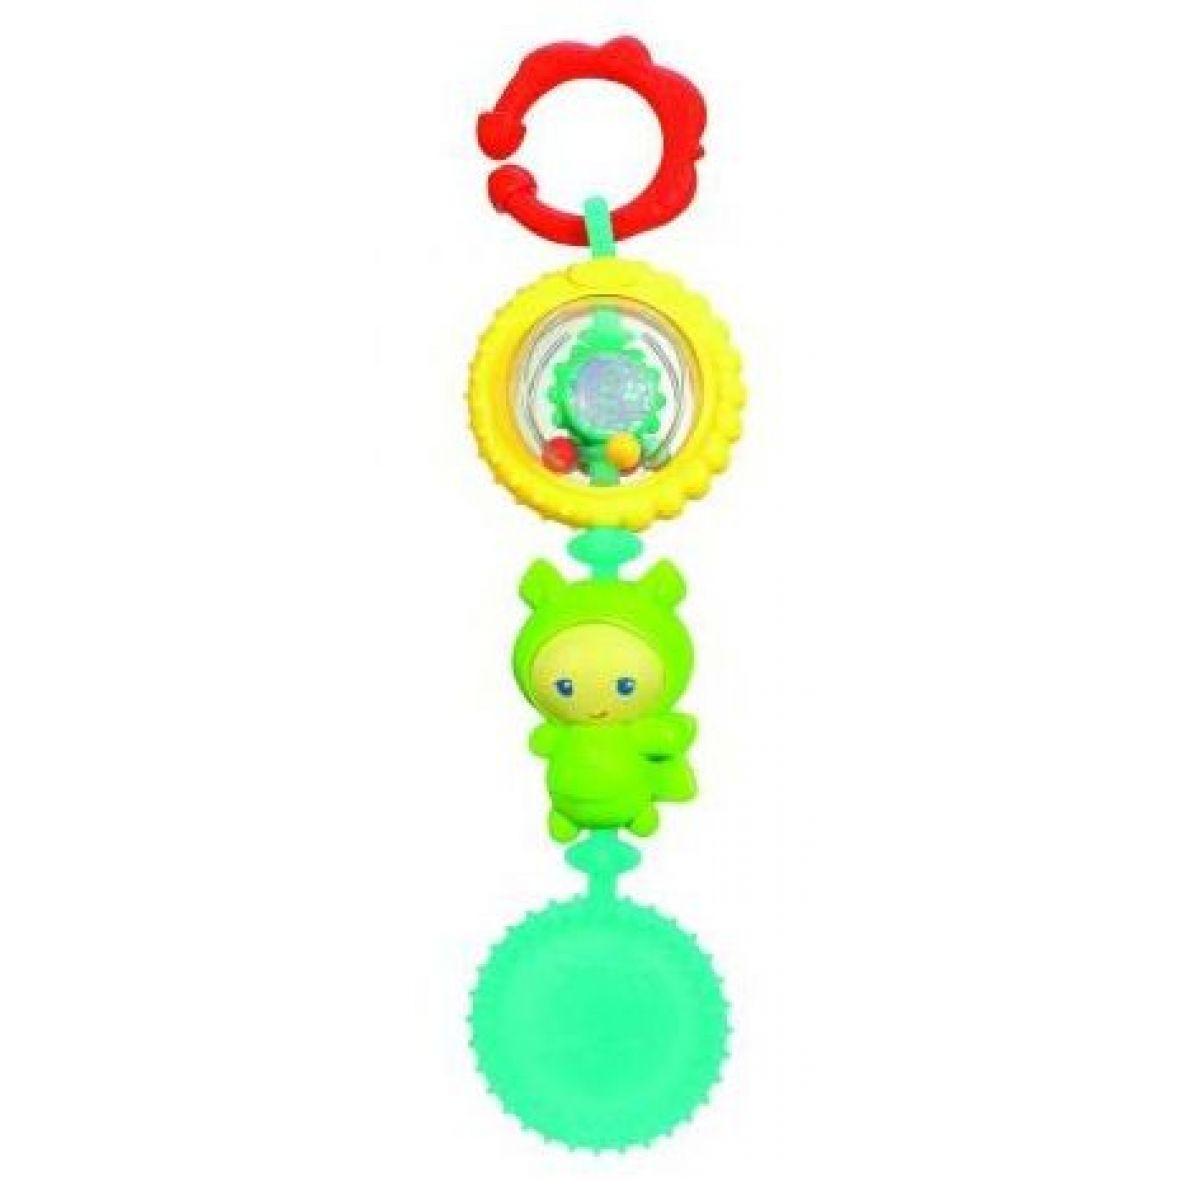 "Hasbro 01471148 - Chrastící """"korálky"", kousátko na zoubky Playskool"